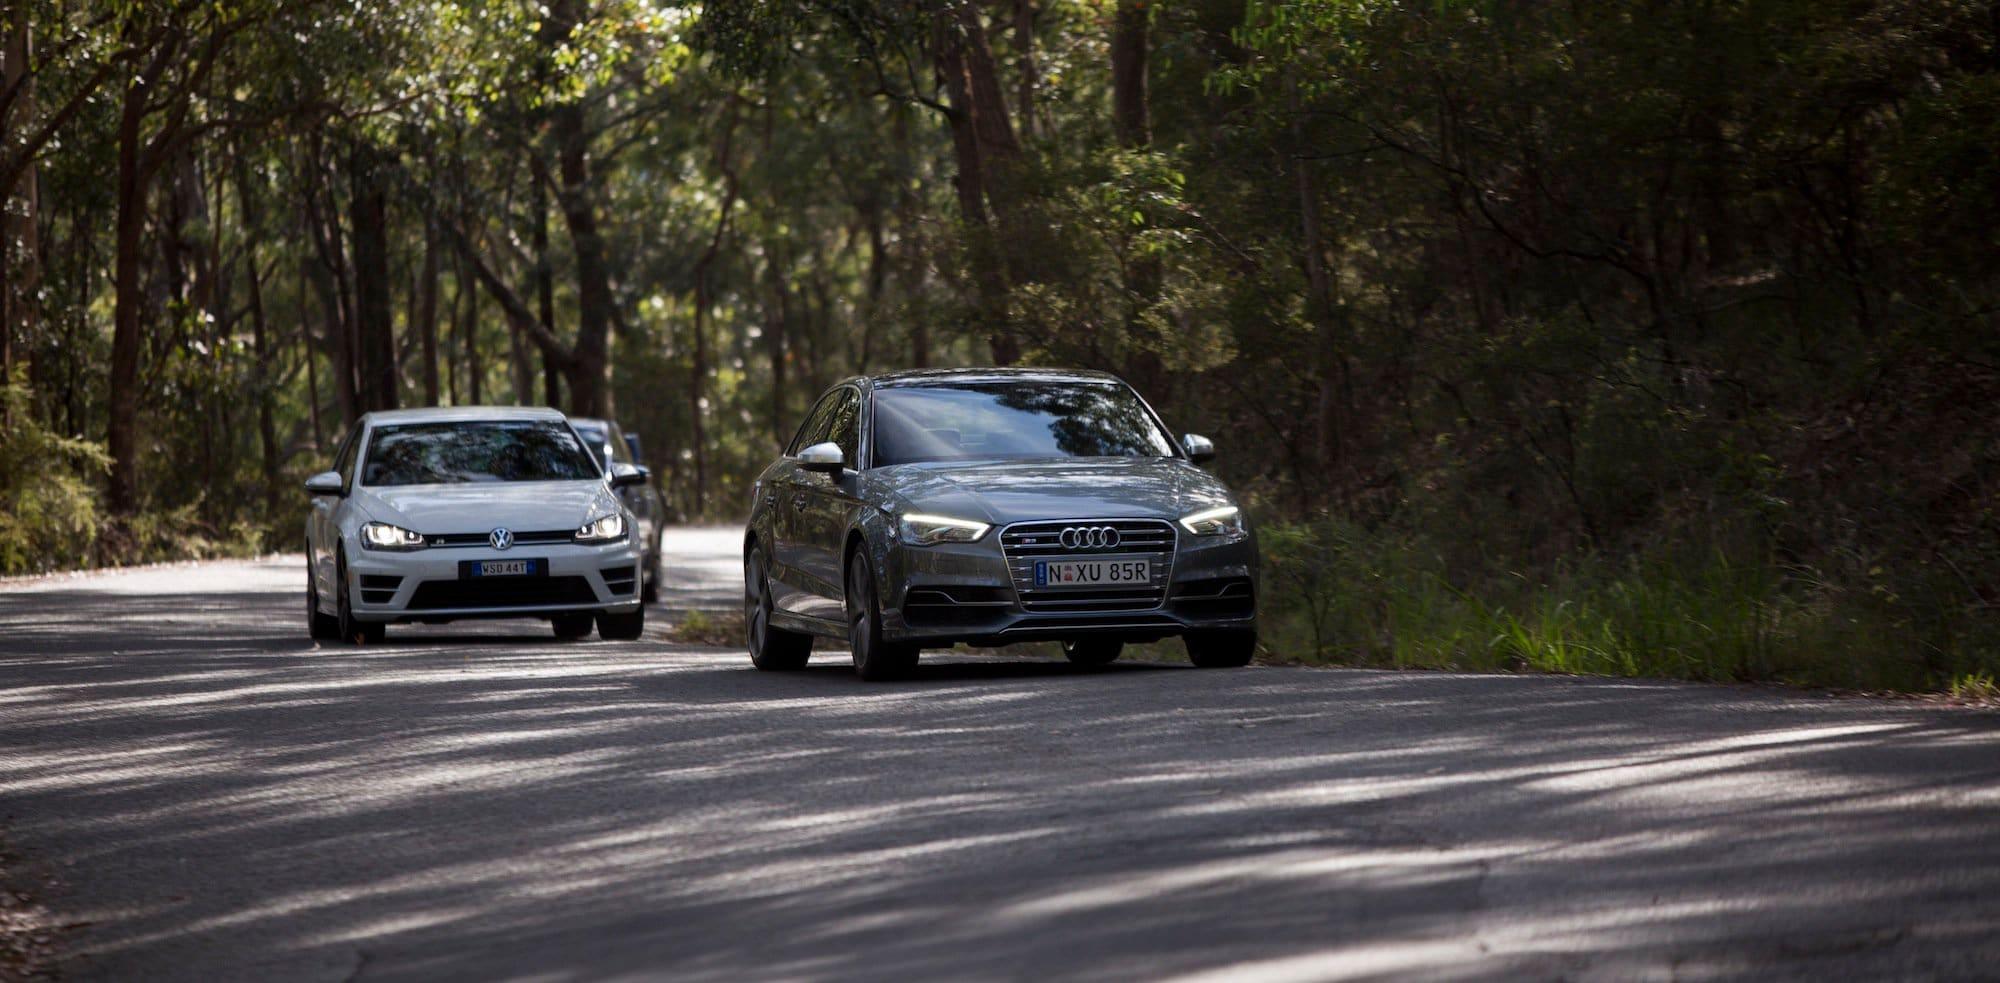 Subaru WRX STI Audi S3 Volkswagen Golf R 3